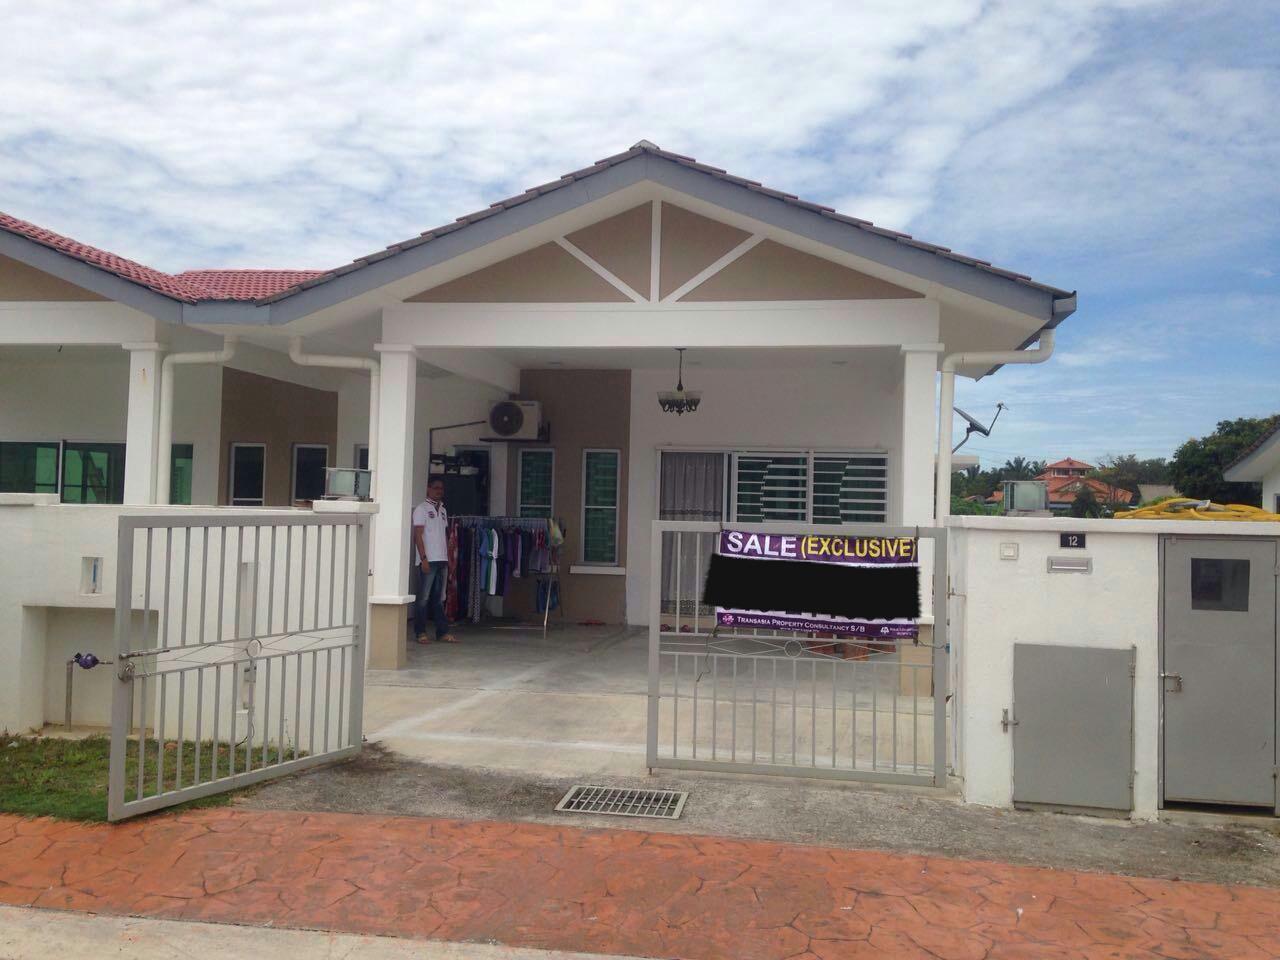 Rumah Semi Detached Seksyen 29 Shah Alam Untuk Dijual Ejen Hartanah Berdaftar House For Sale In Shah Alam Harga Rumah Market Value Agensi Bumiputera Melayu Muslim Hartaprima Com